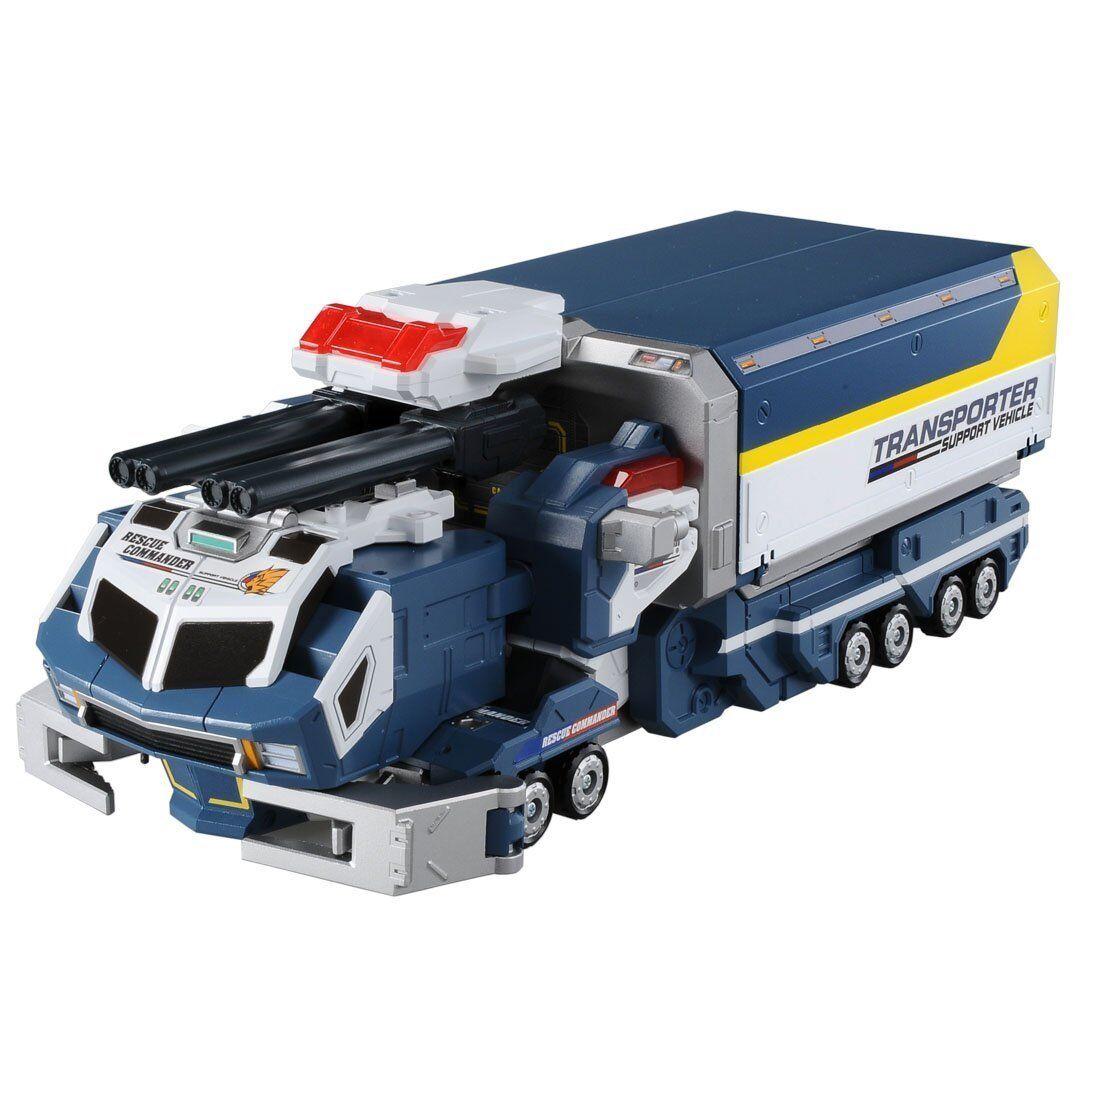 Takara Tomy Tomica Hyper Rescue Drive Head Transporter Gaia Action Figure